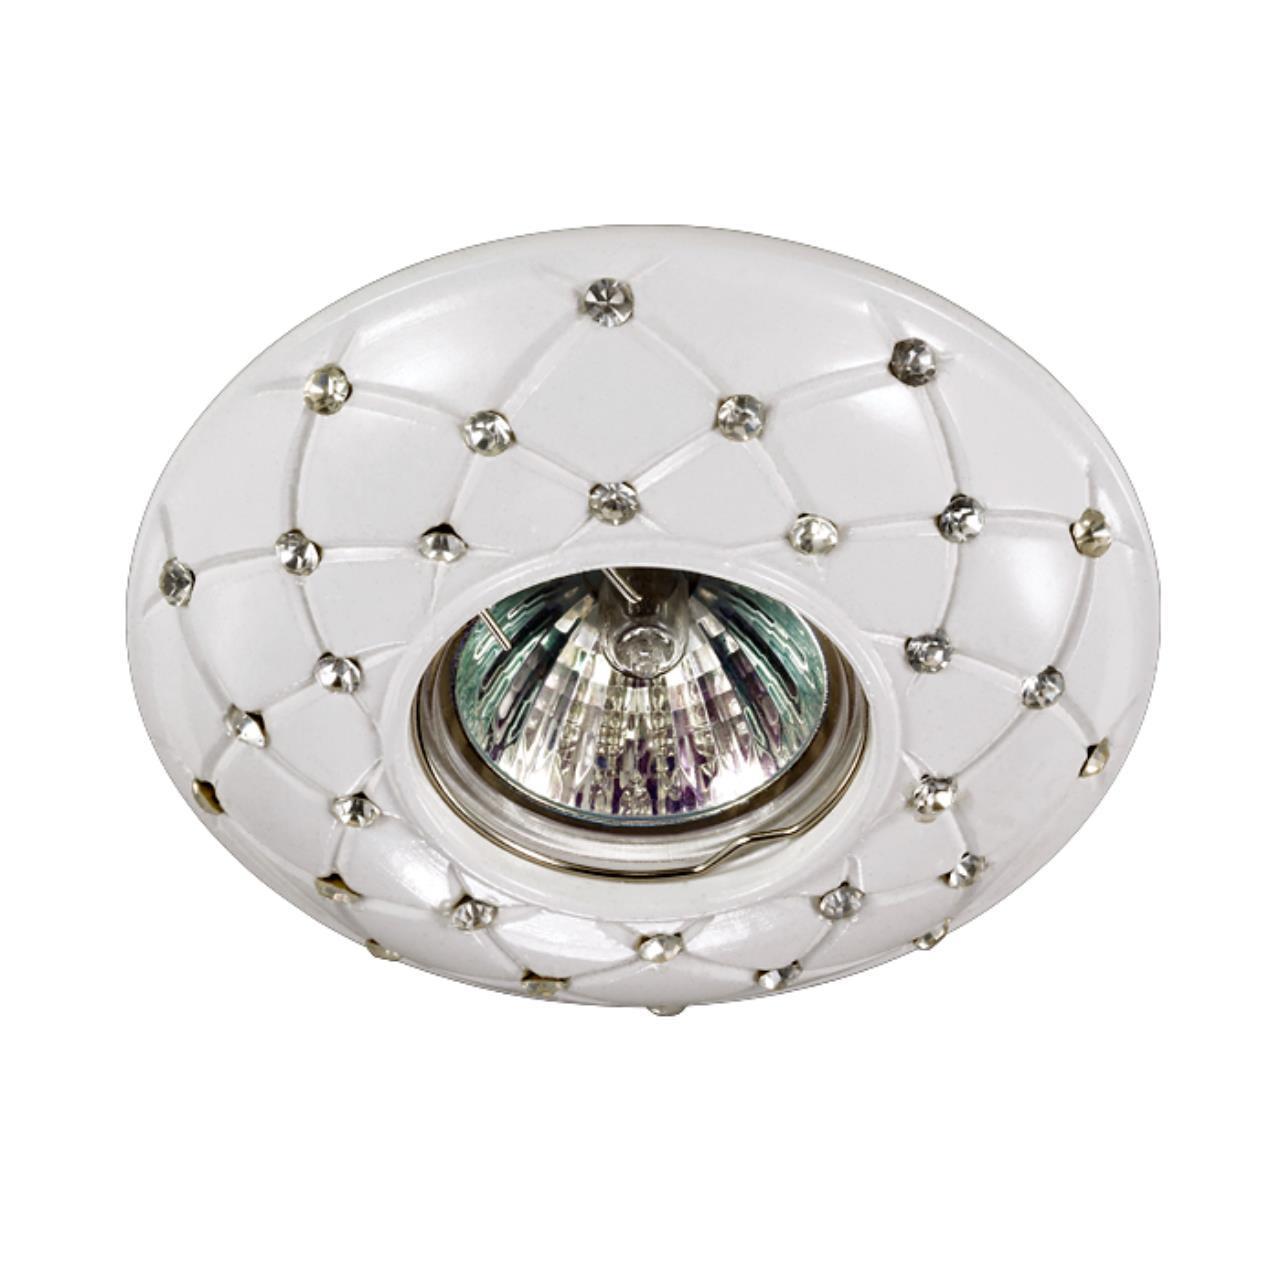 370129 SPOT NT15 117 белый Встраиваемый светильник IP20 GX5.3 50W 12V PATTERN